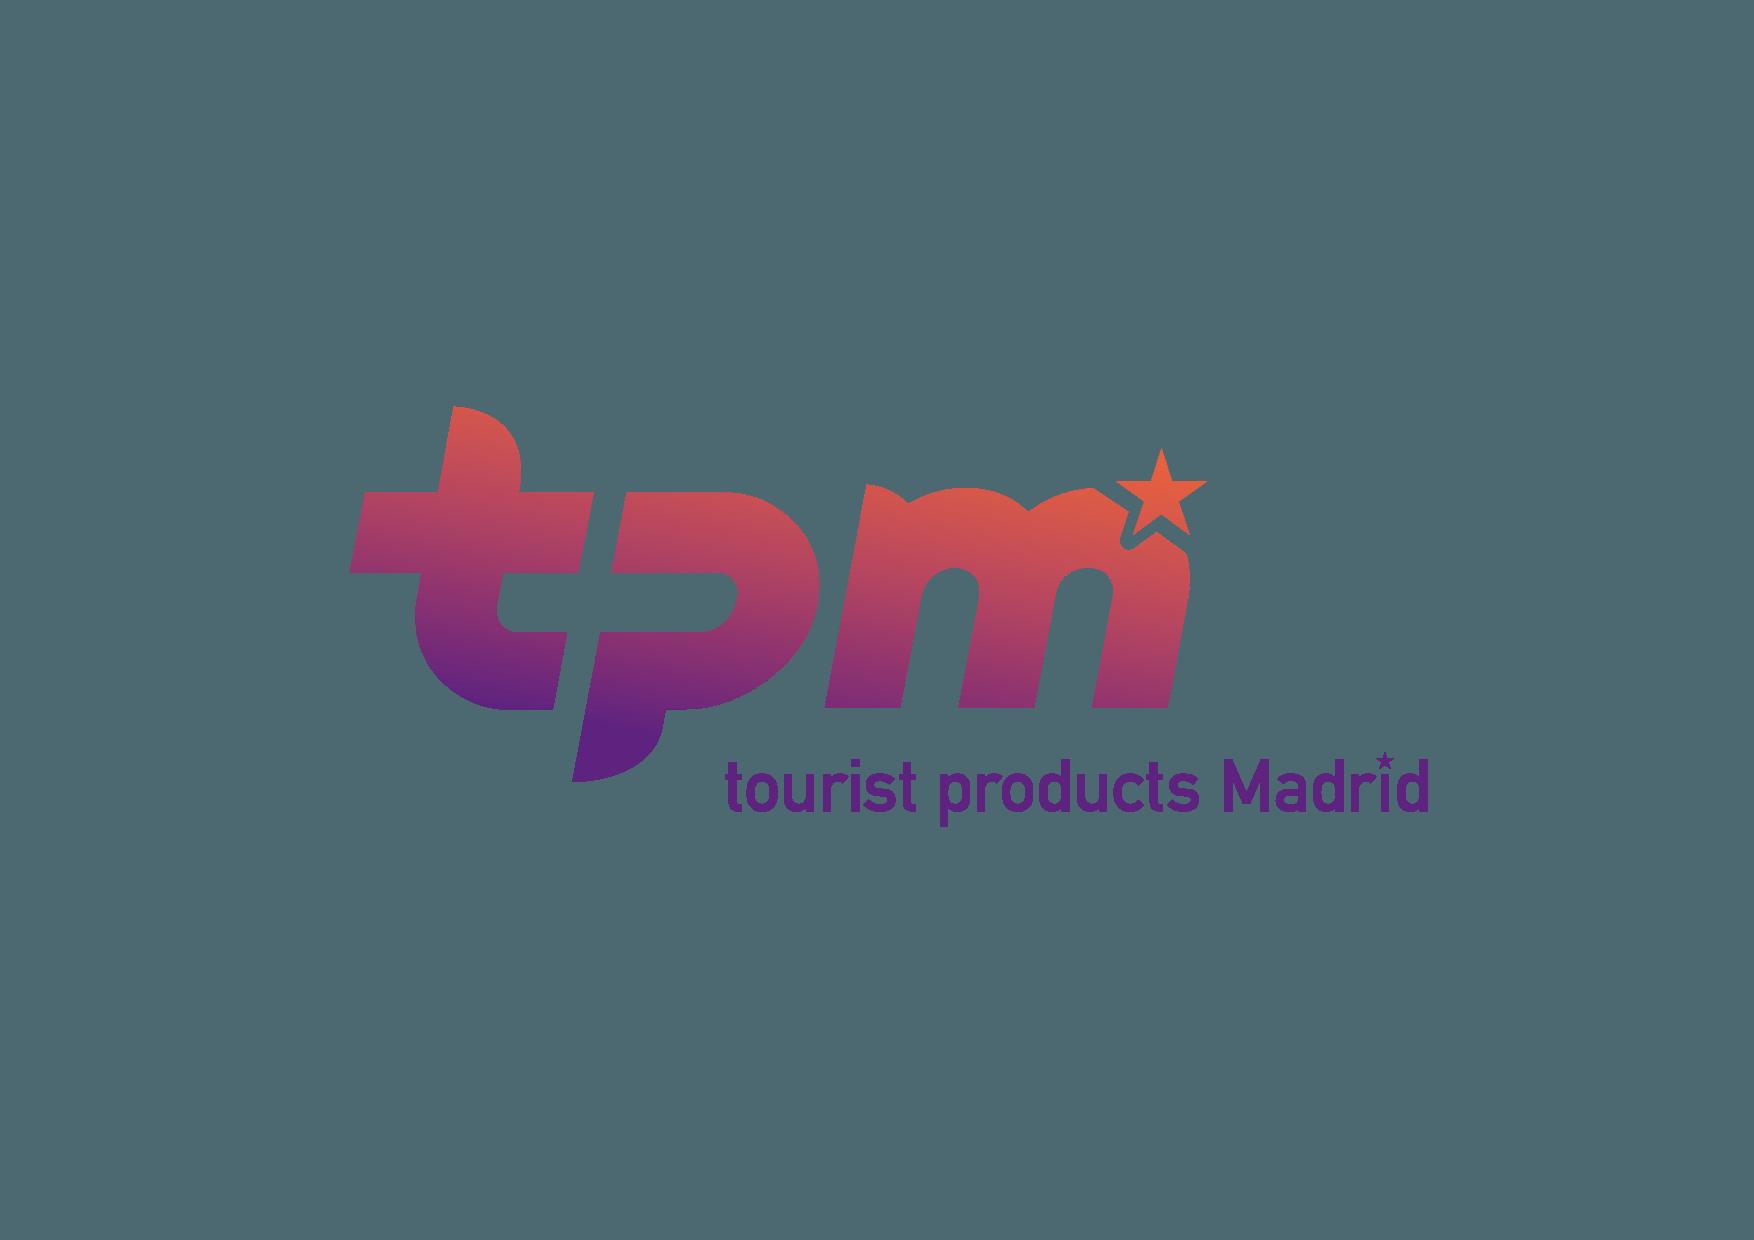 diseño de logotipo para empresa turística